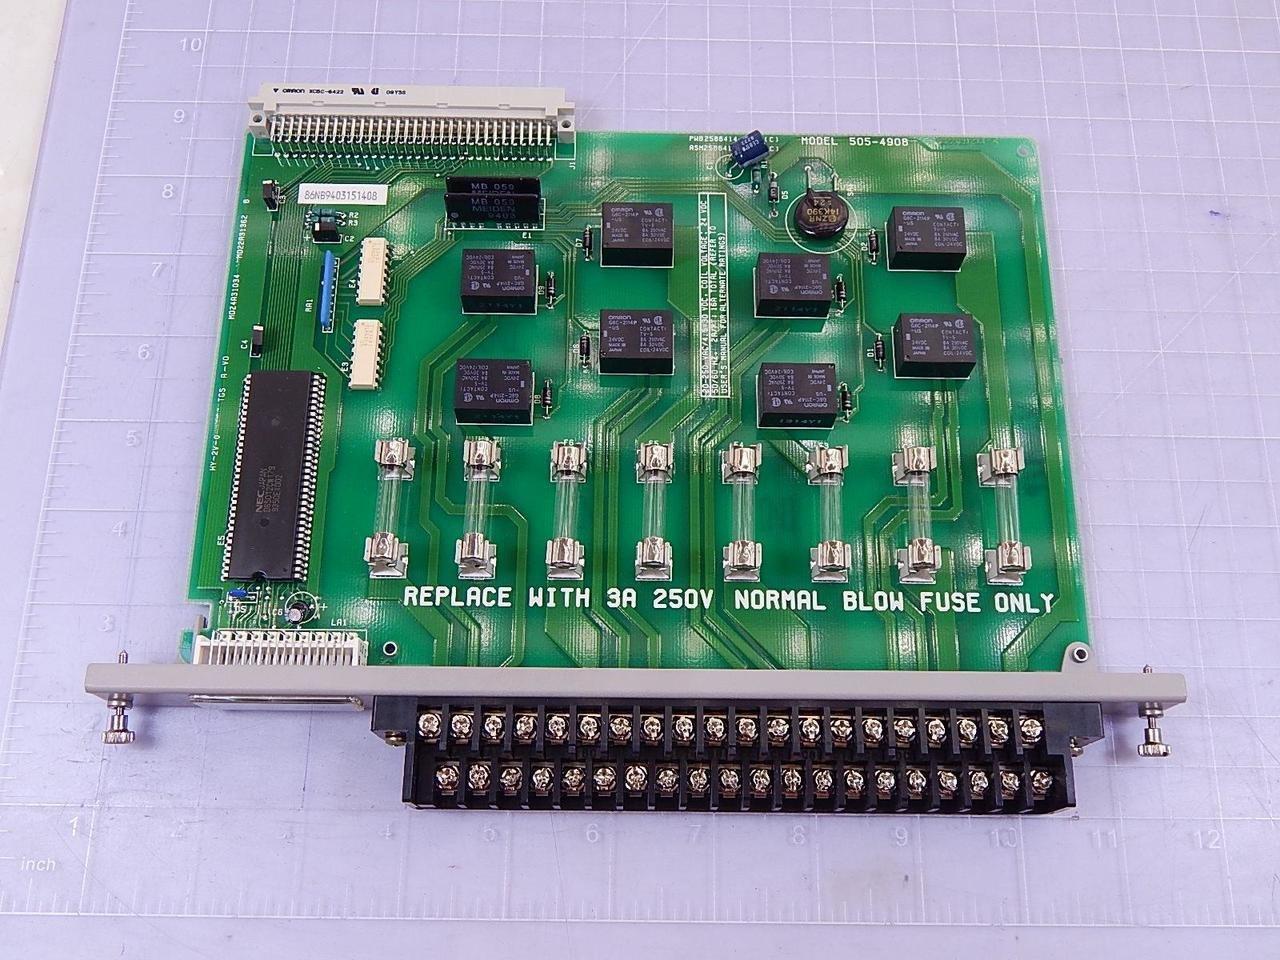 81yxNvN2VIL._SL1280_ siemens 505 4908 relay output module plc cti texas instruments ti  at aneh.co